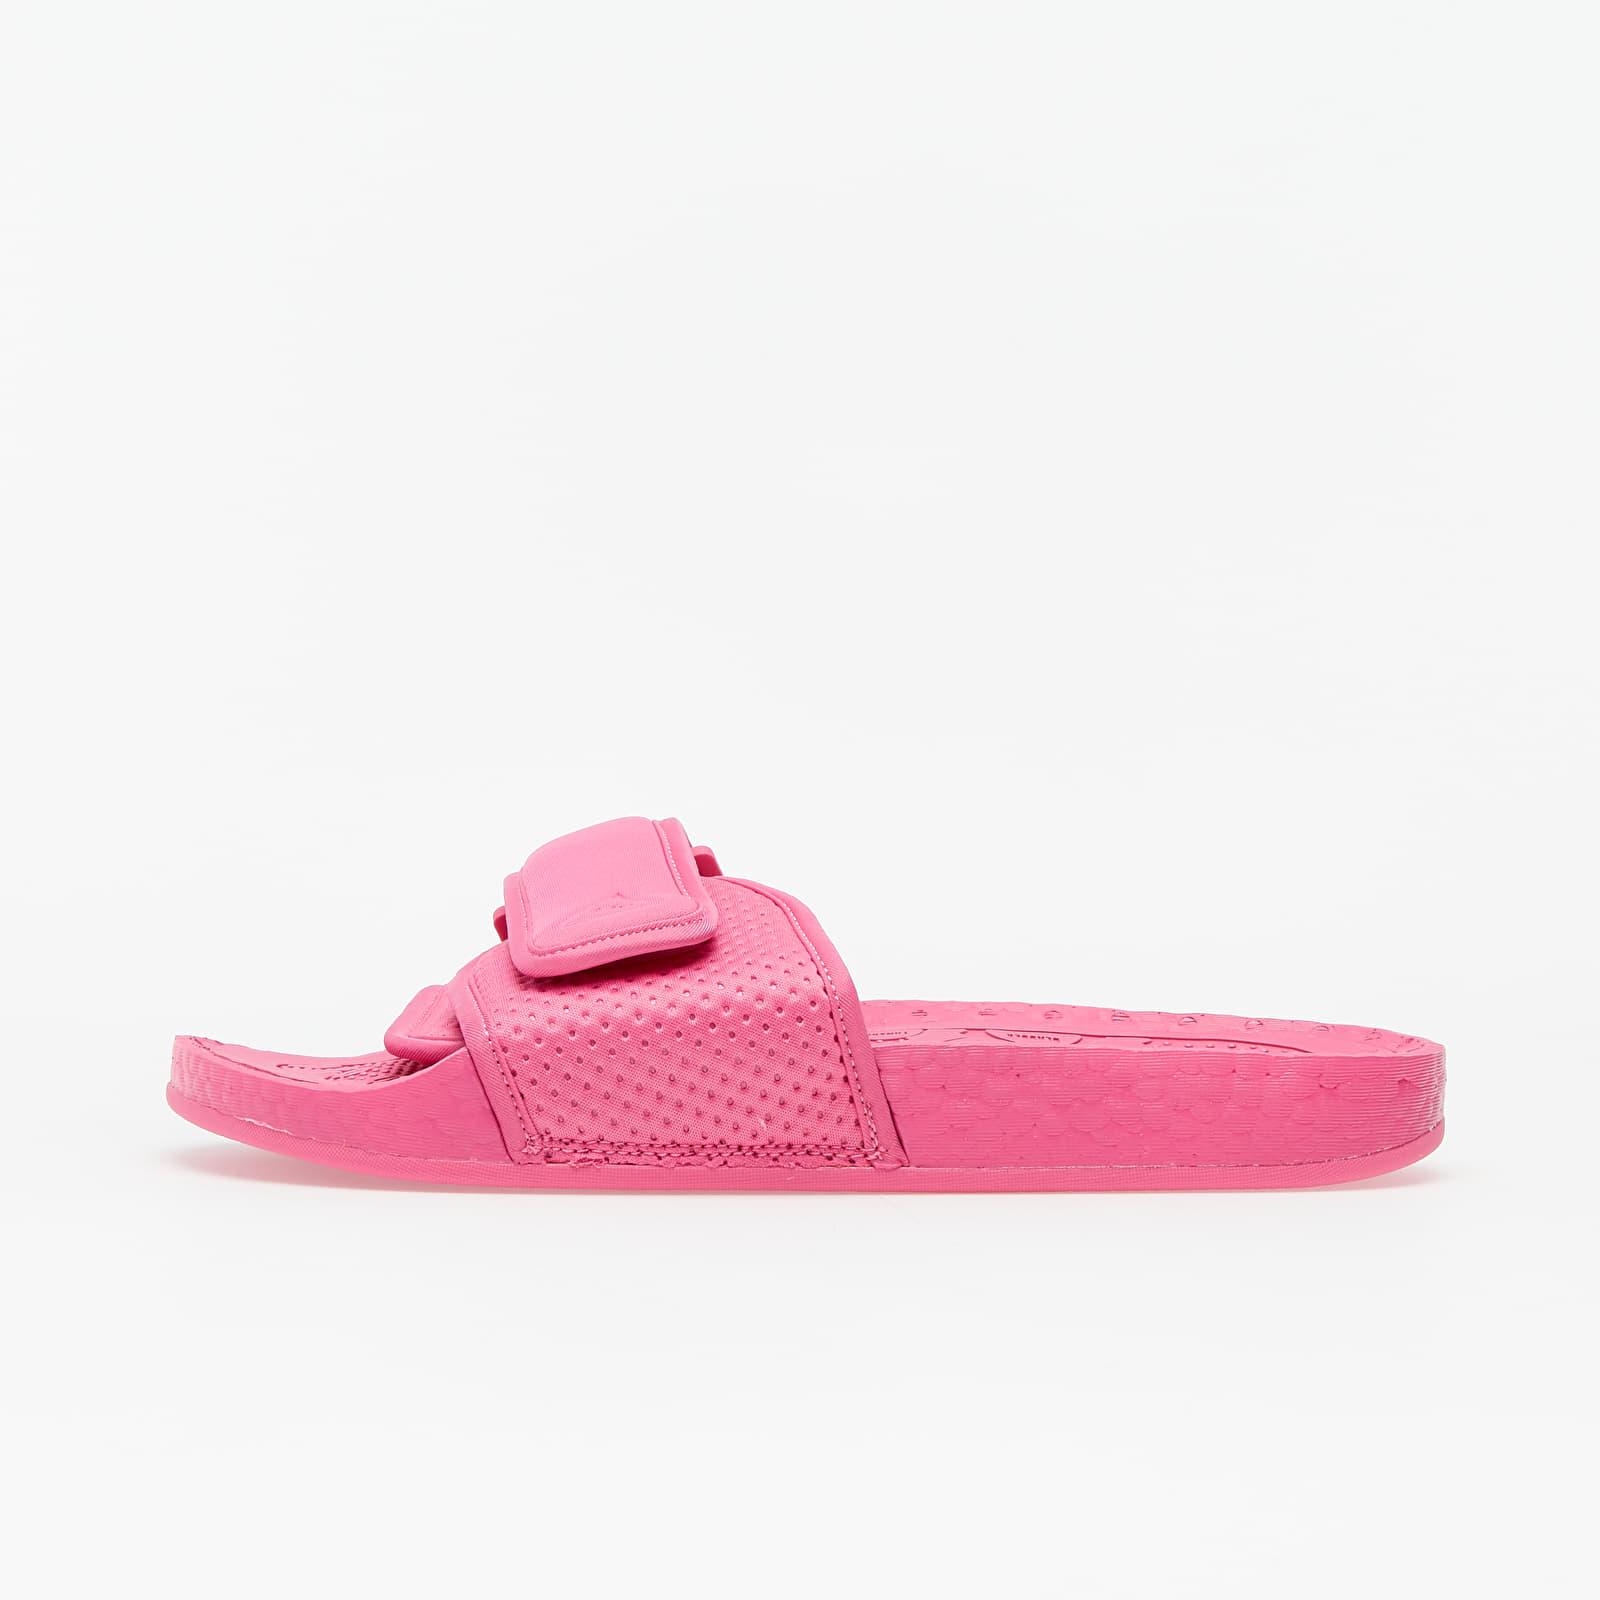 Men's shoes adidas x Pharrell Williams Chancletas Hu Semi Solar Pink/ Semi Solar Pink/ Semi Solar Pink